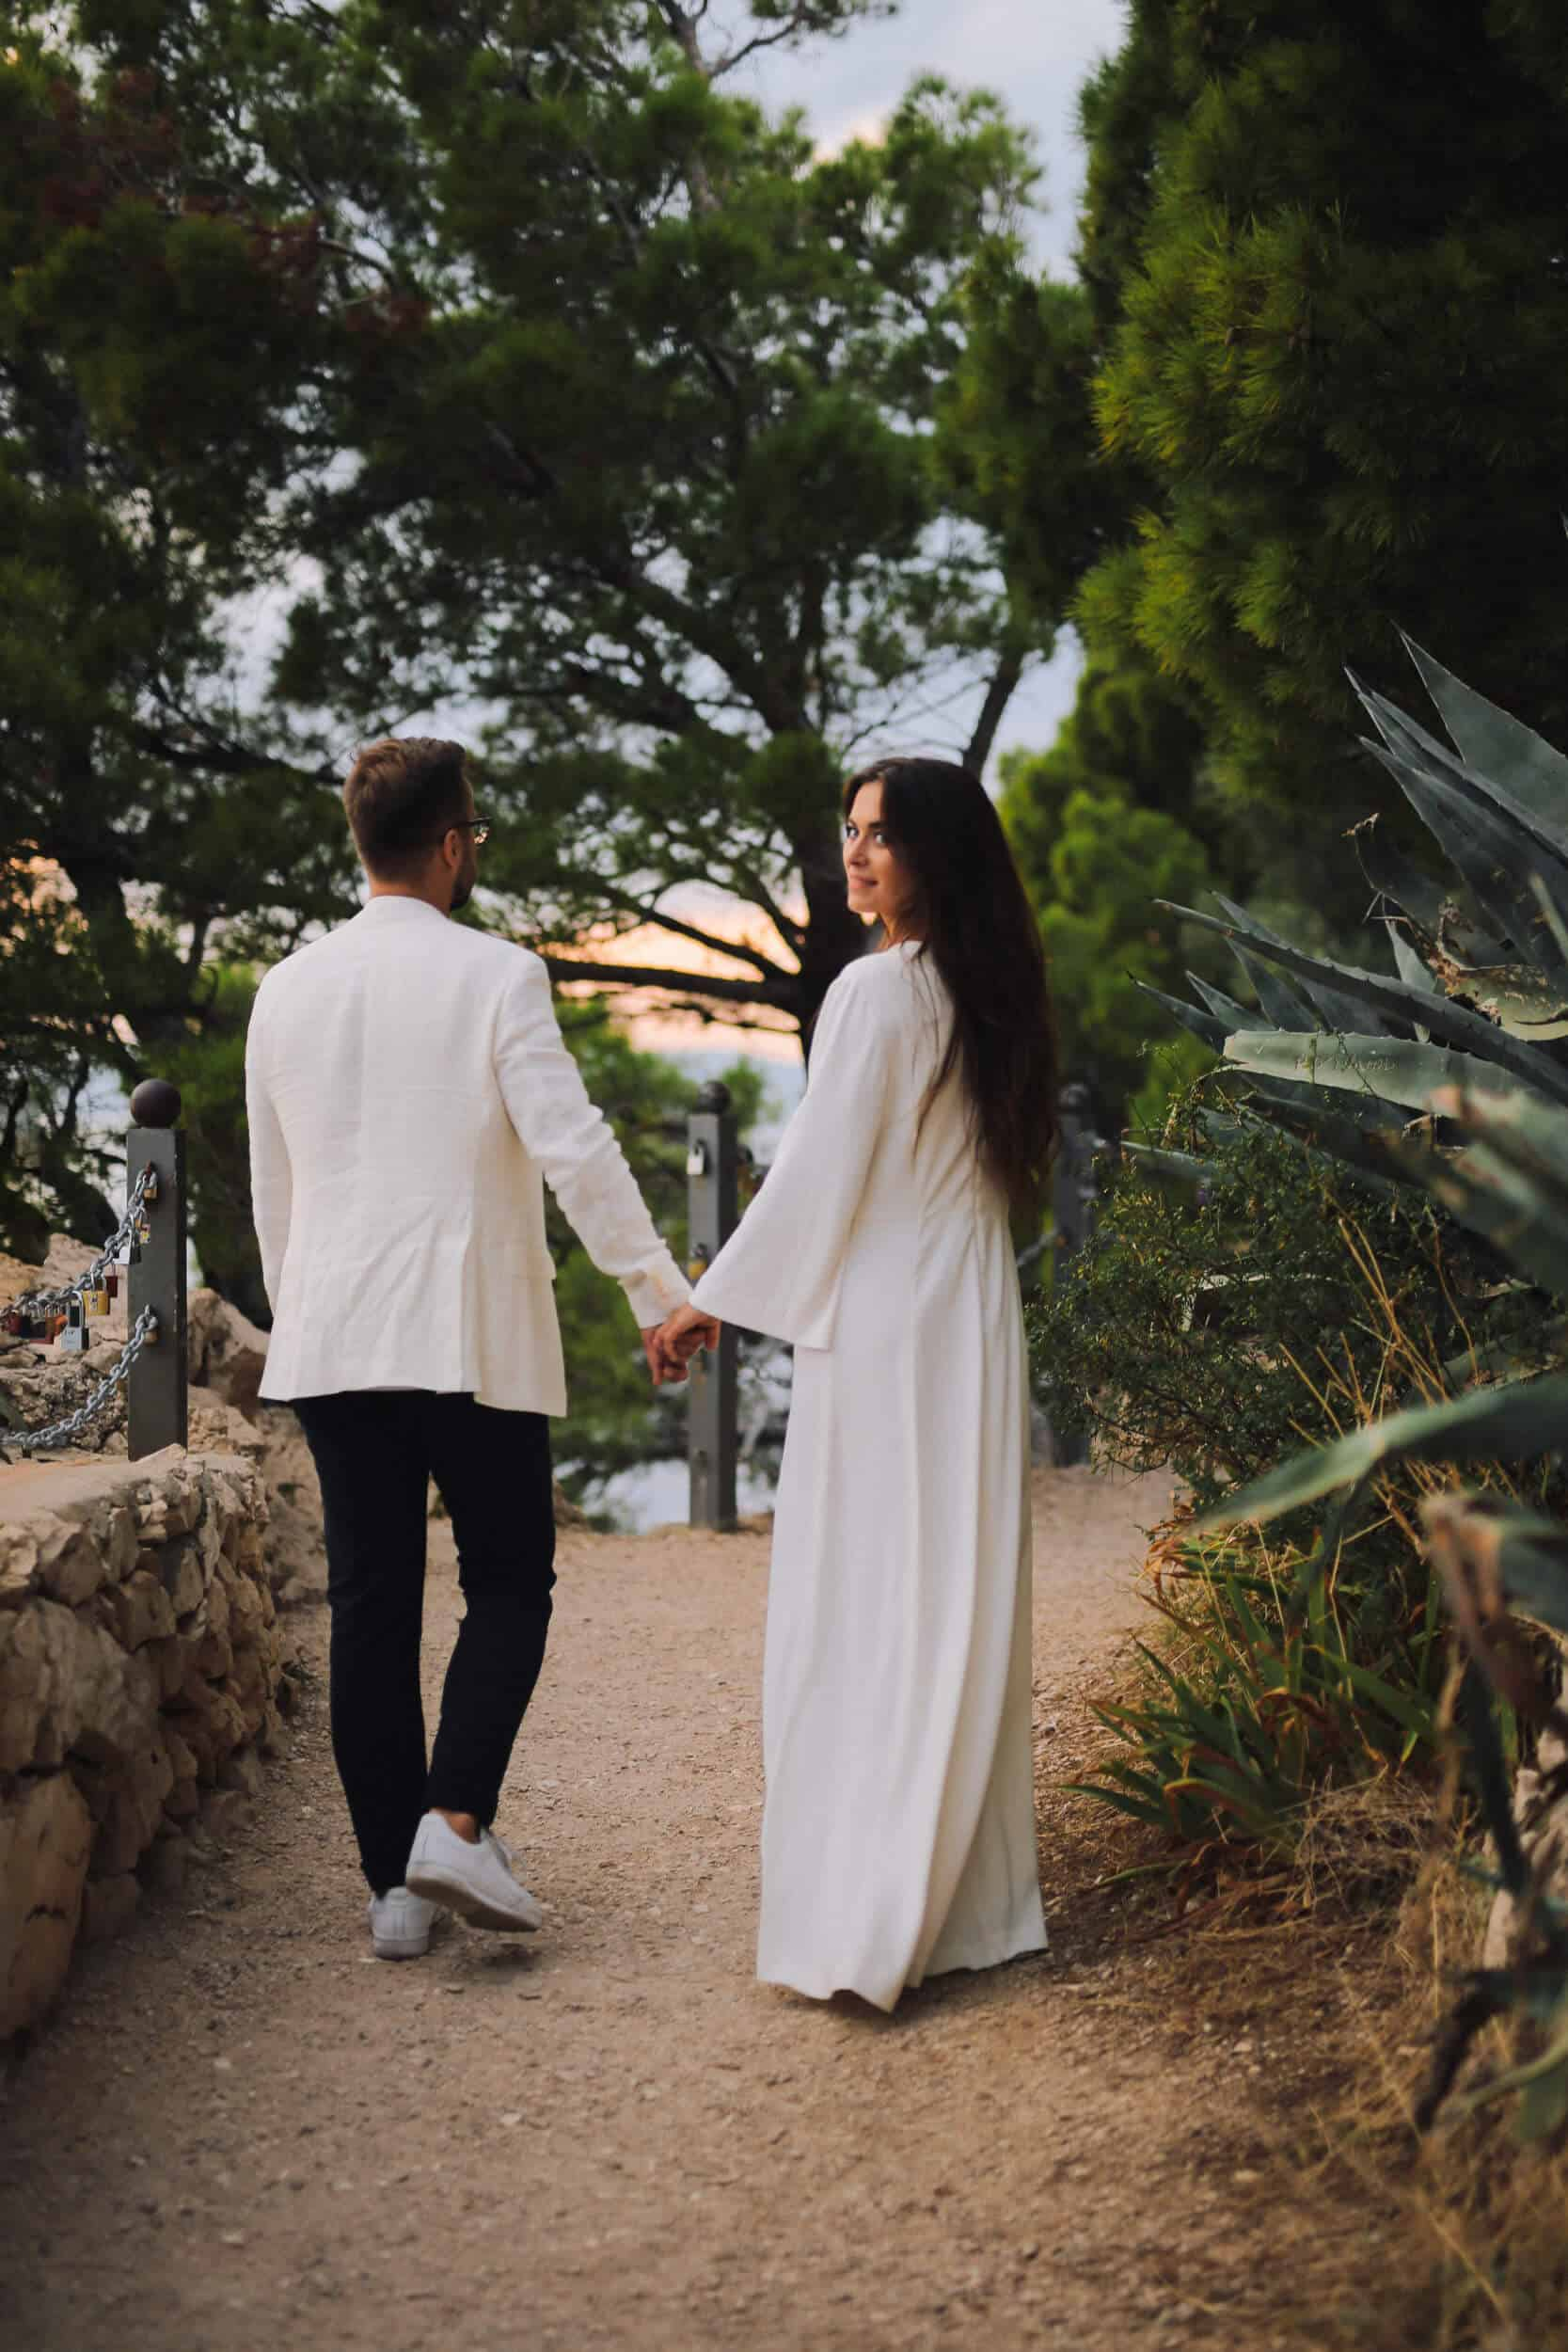 Croatia honeymoon ideas 008 | Croatia Elopement Photographer and Videographer